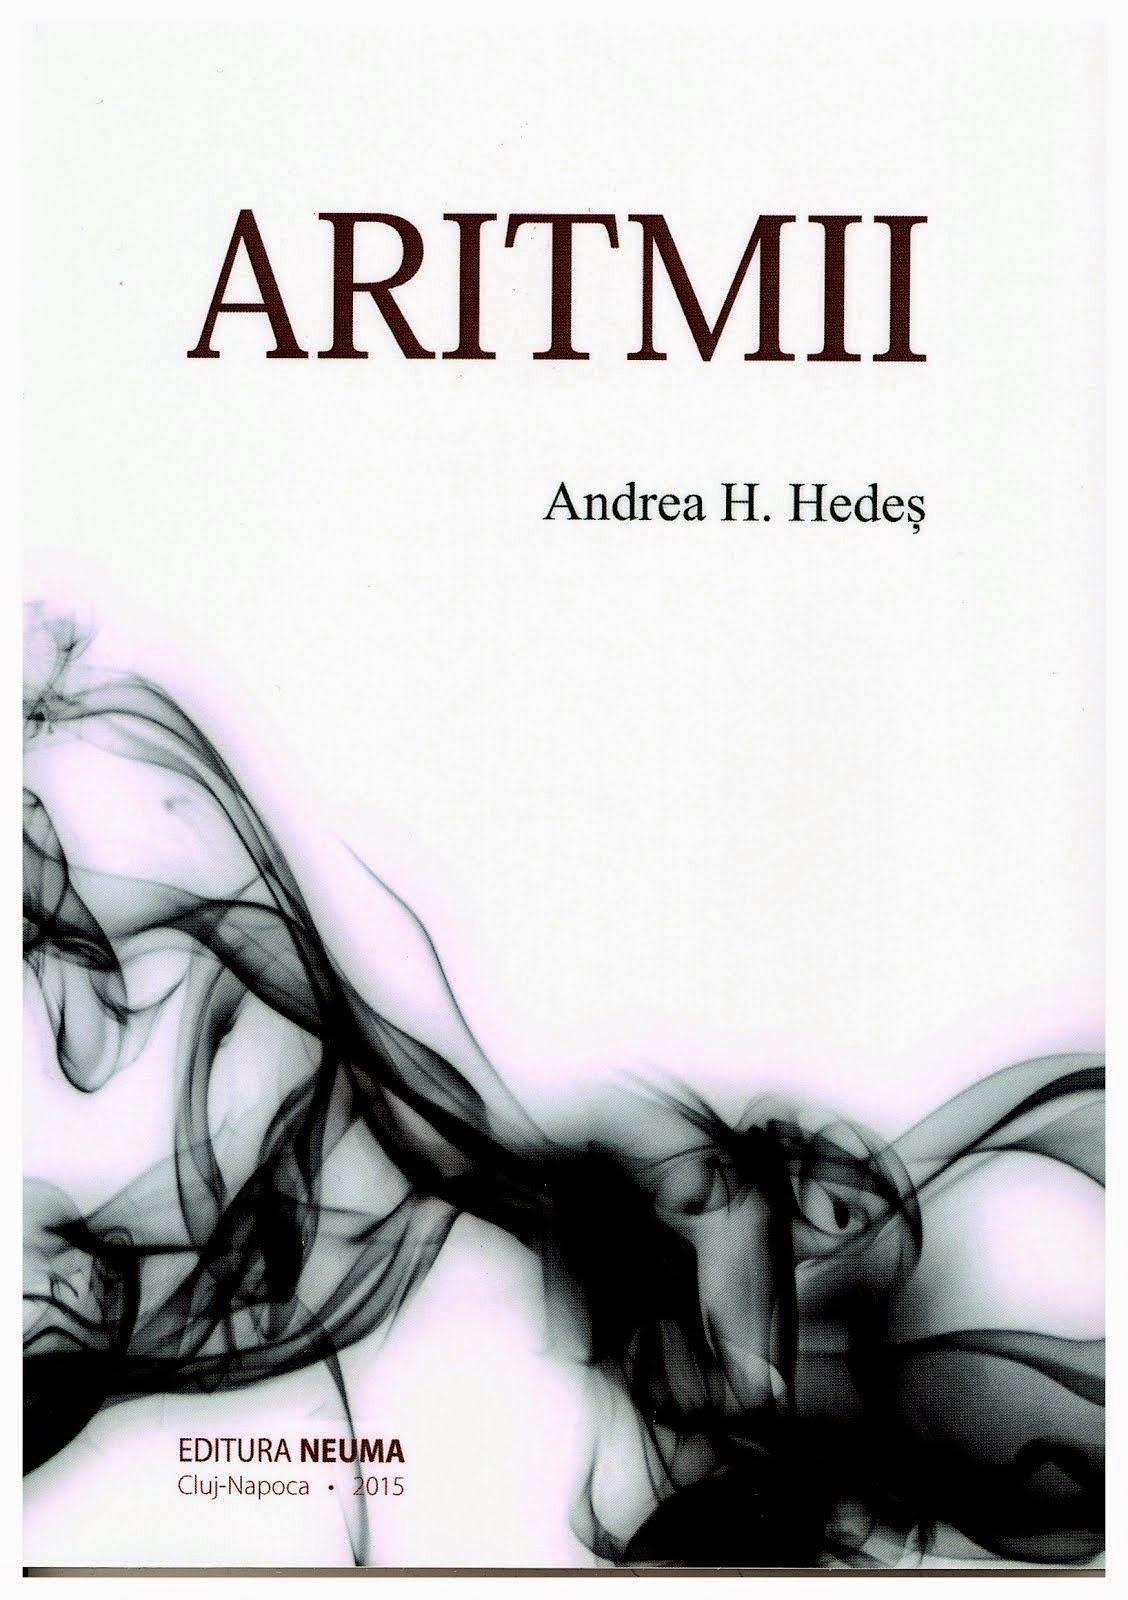 Aritmii, Poeme